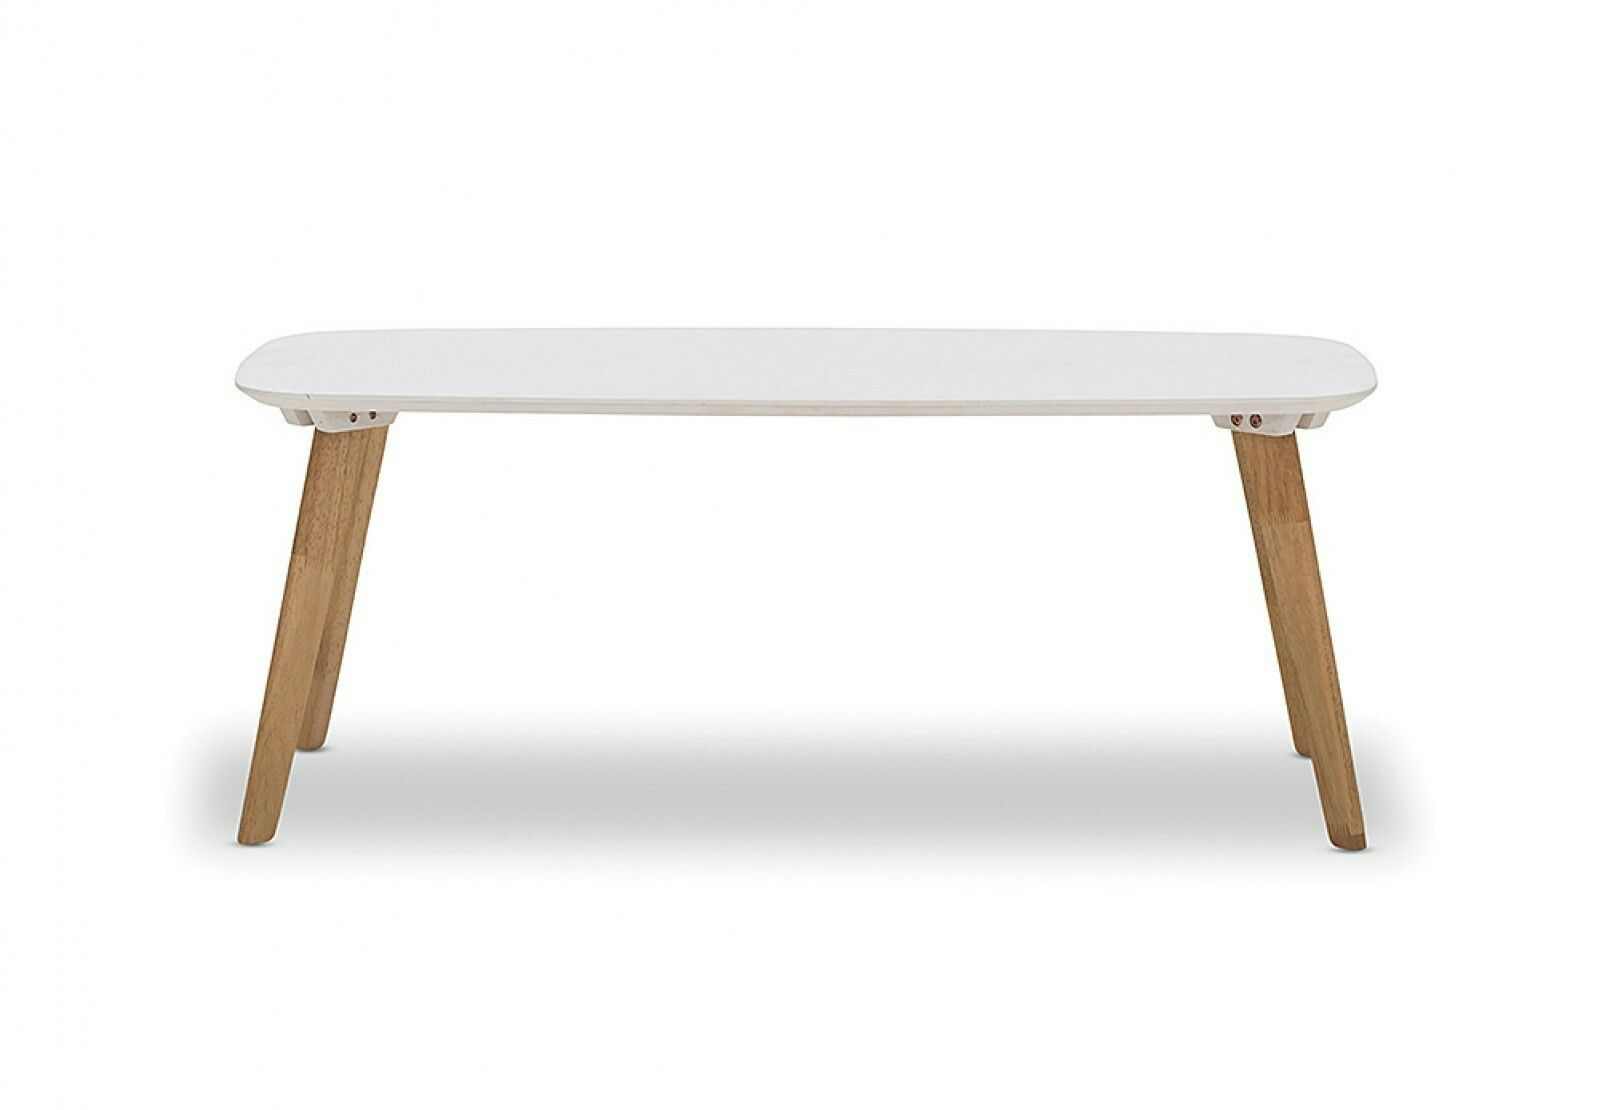 Sven Coffee Table Super Amart 110 50 45